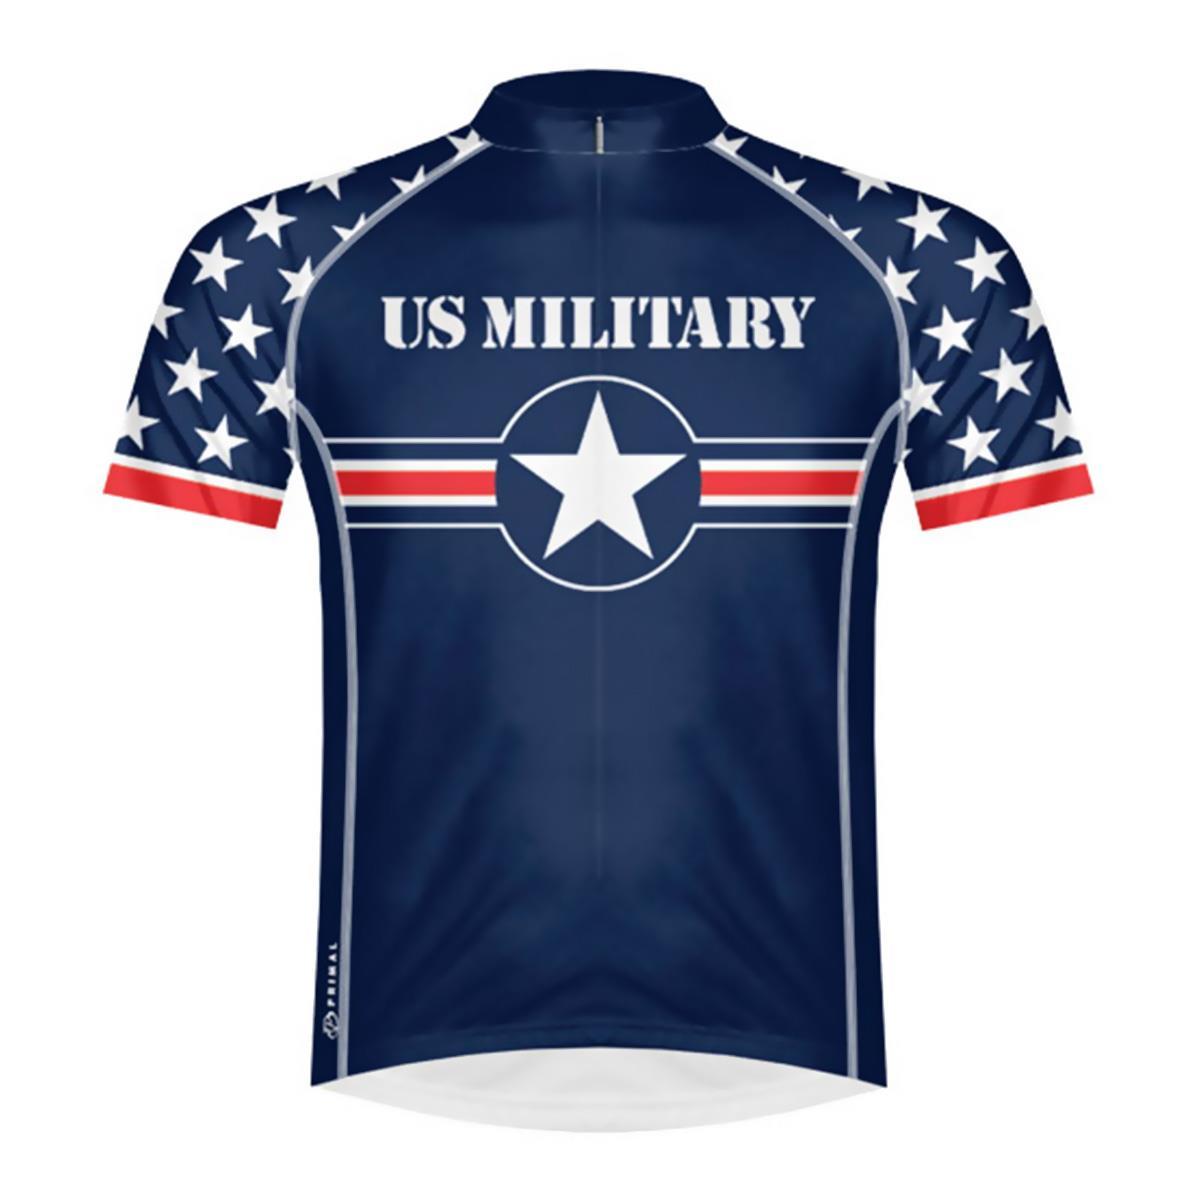 b975dab69 Primal Wear Men s U.S. Military Team 2015 Cycling Jersey UMI5J20M (XL)